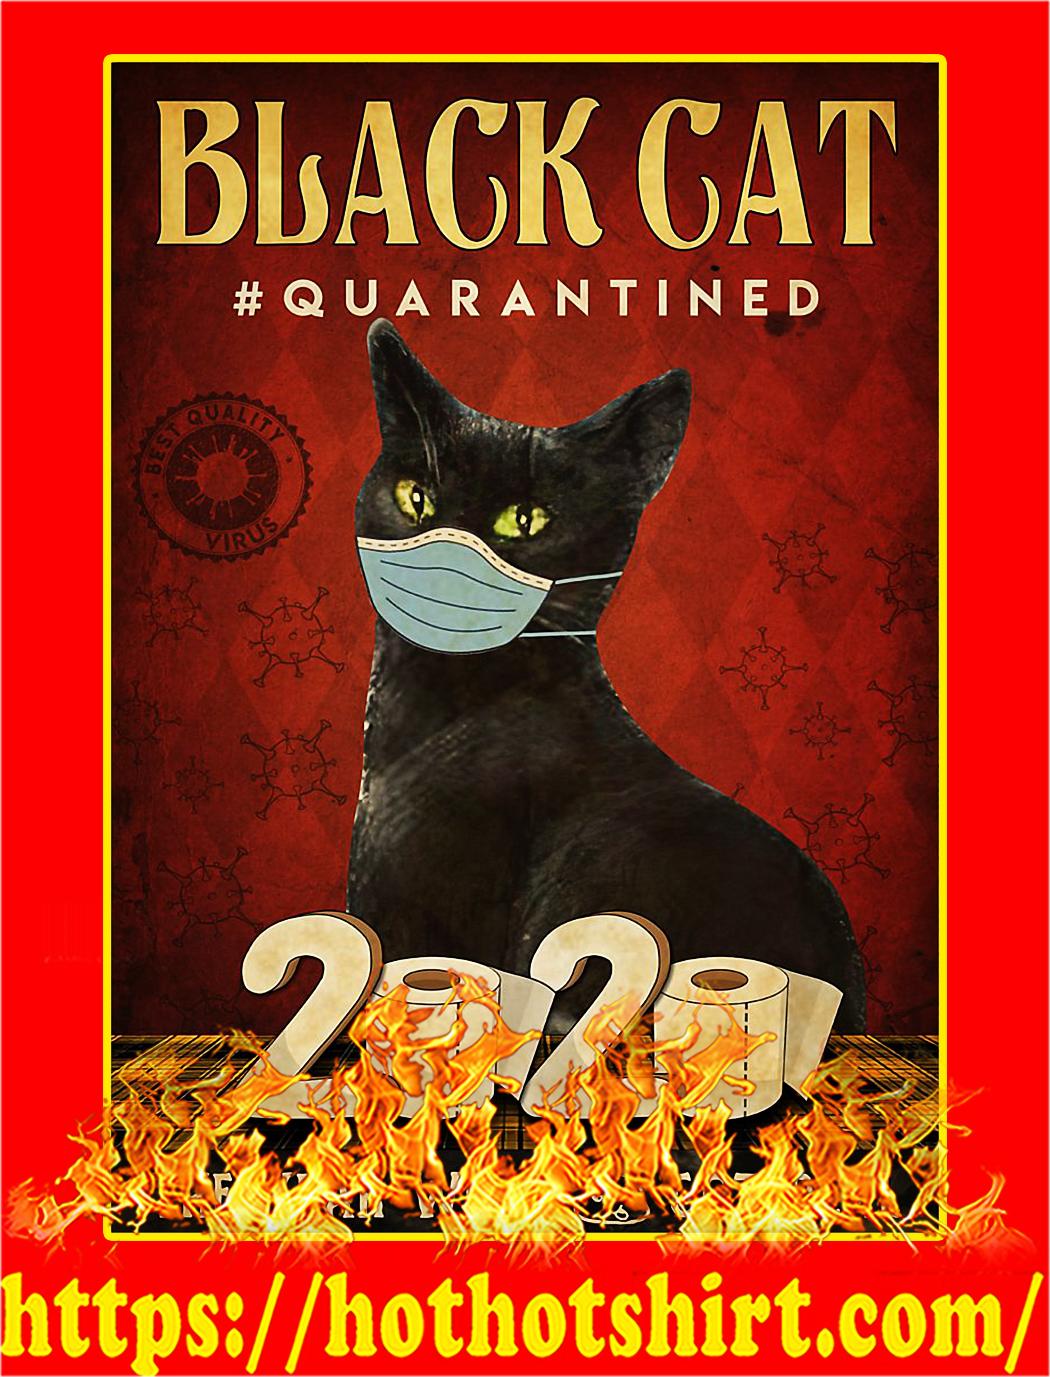 Black cat quarantined 2020 poster